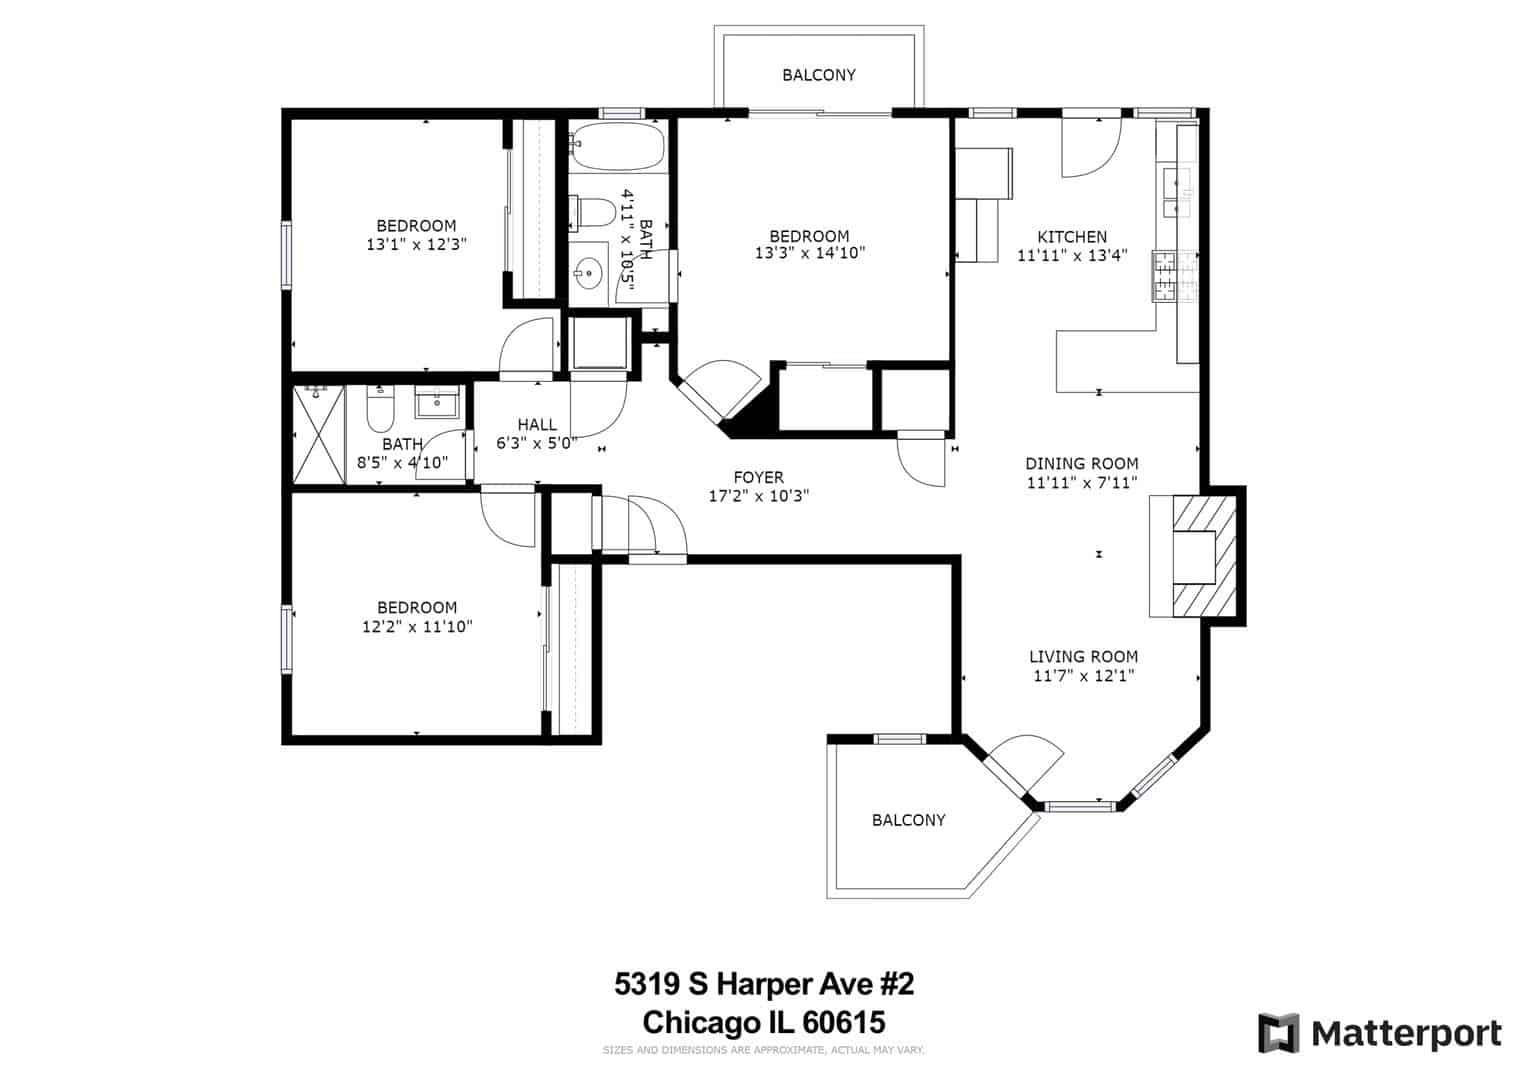 5319 South Harper - Floor Plan